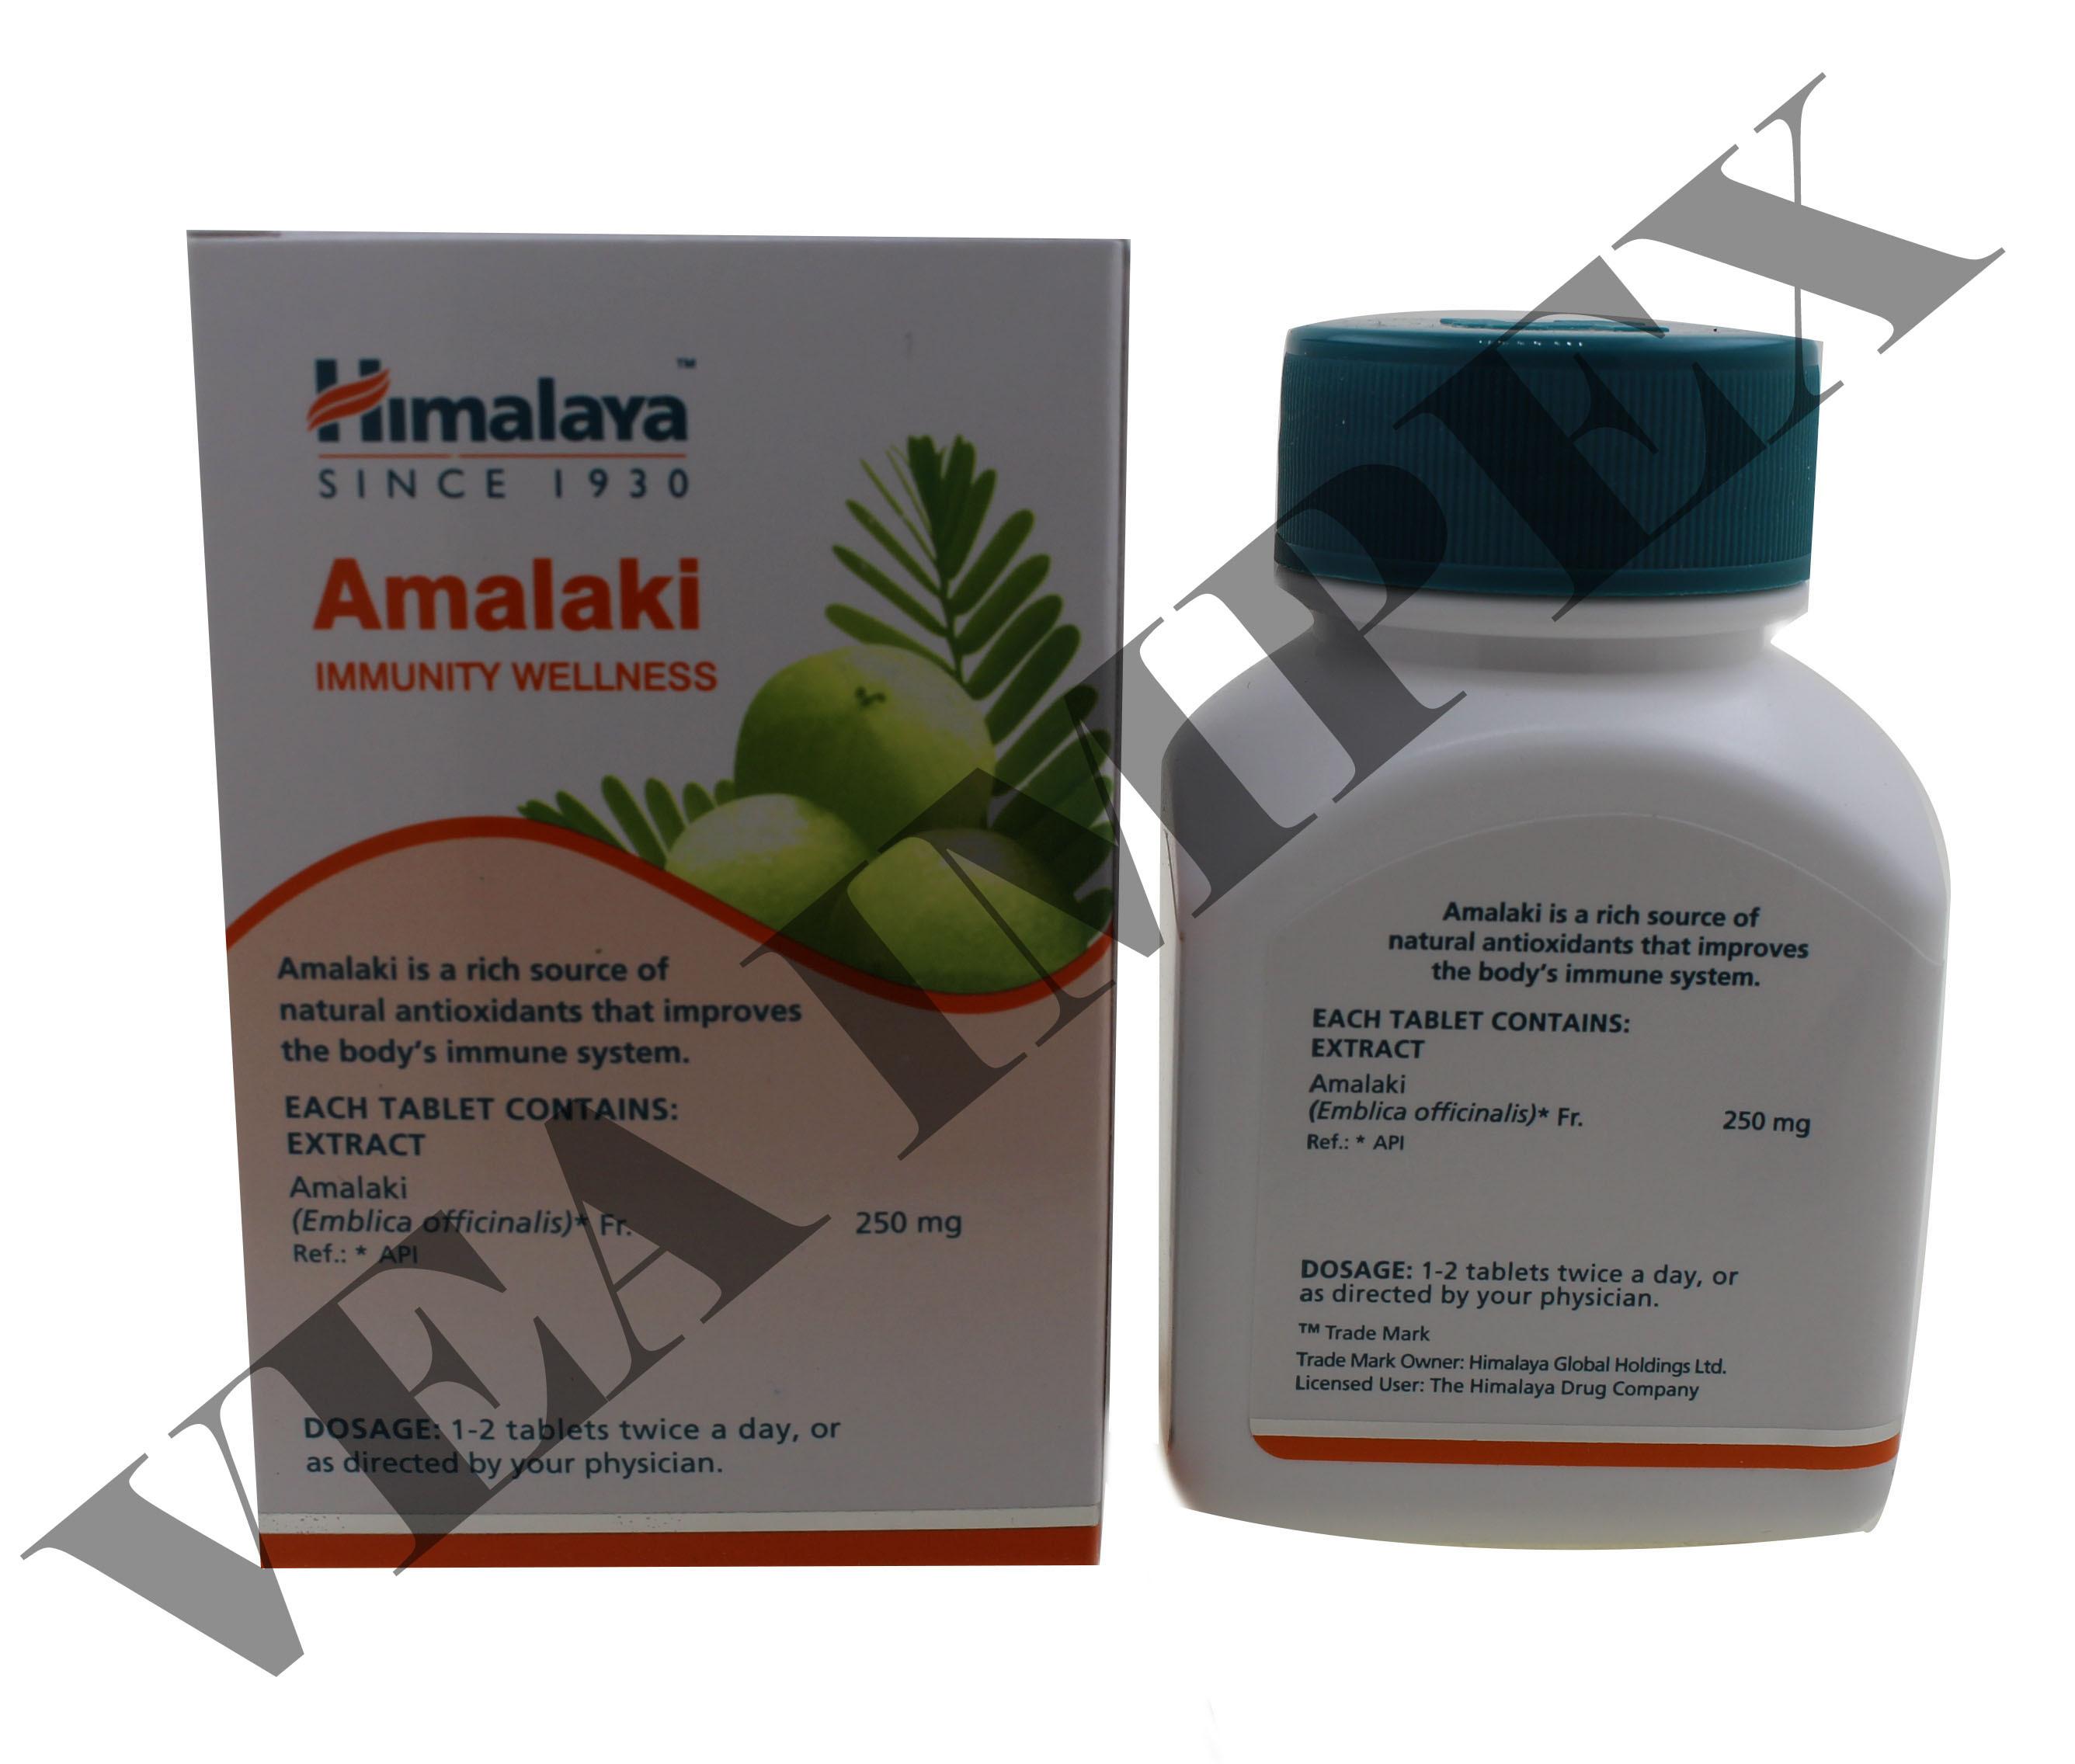 AMALAKI IMMUNITY WELLNESS